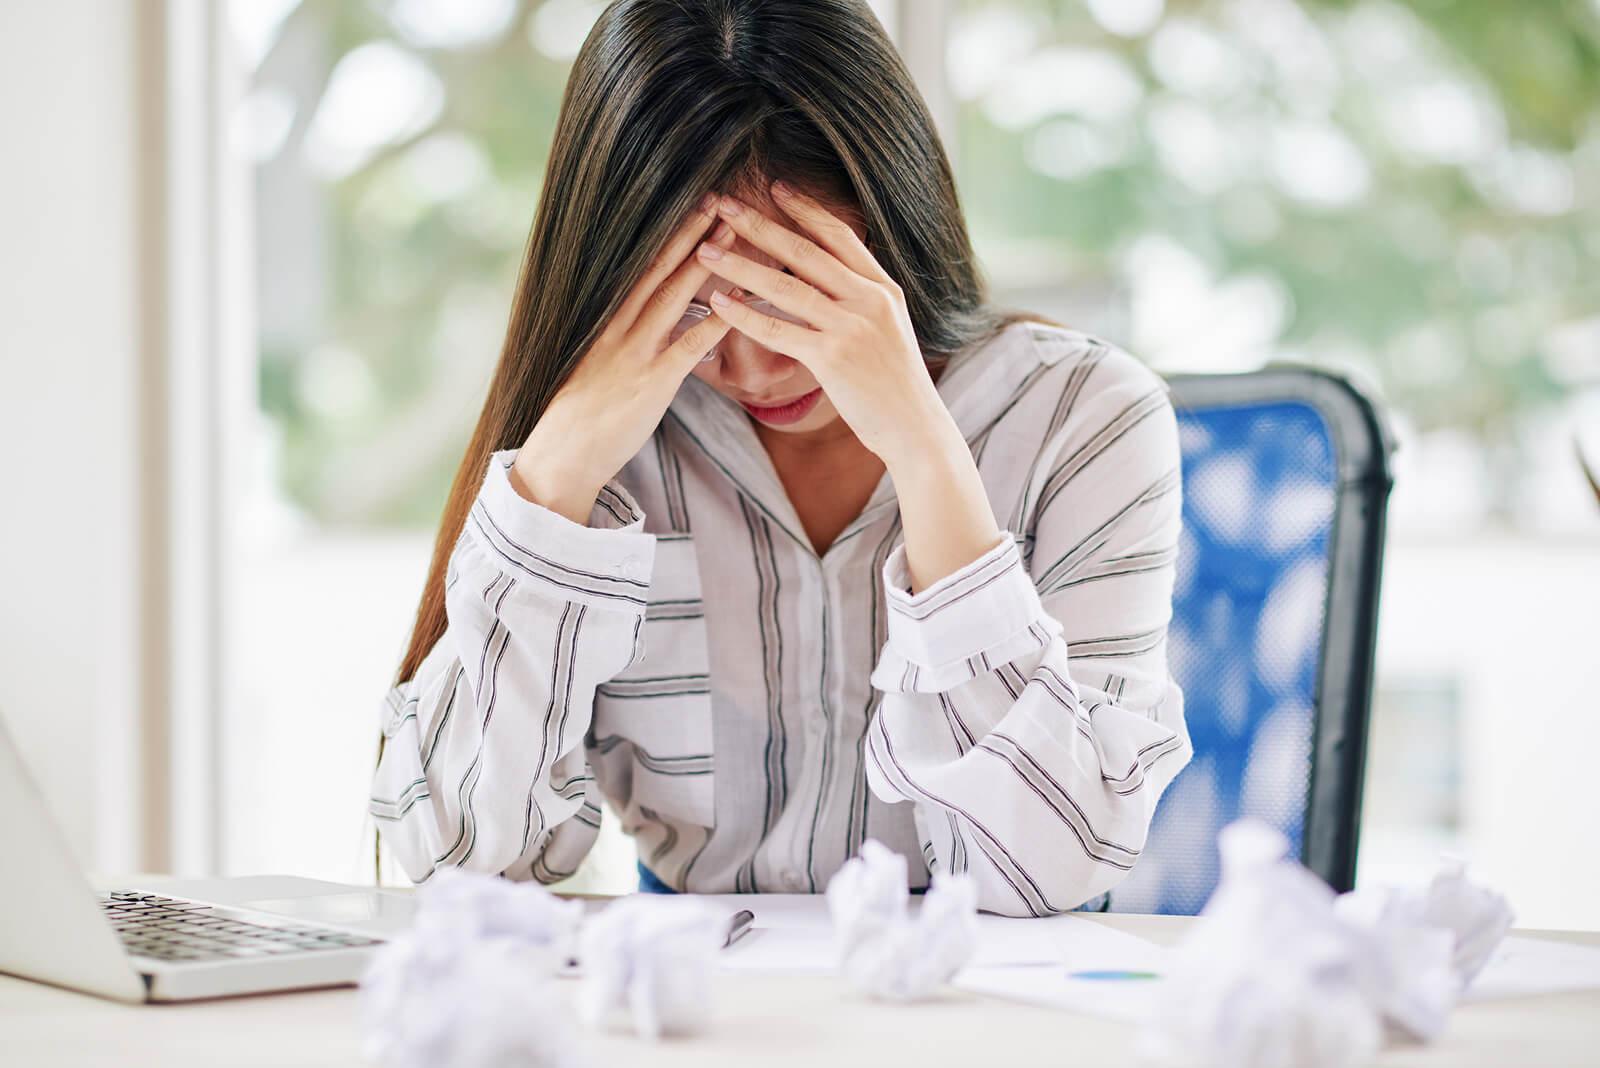 5 Tips to Help you Get Unstuck